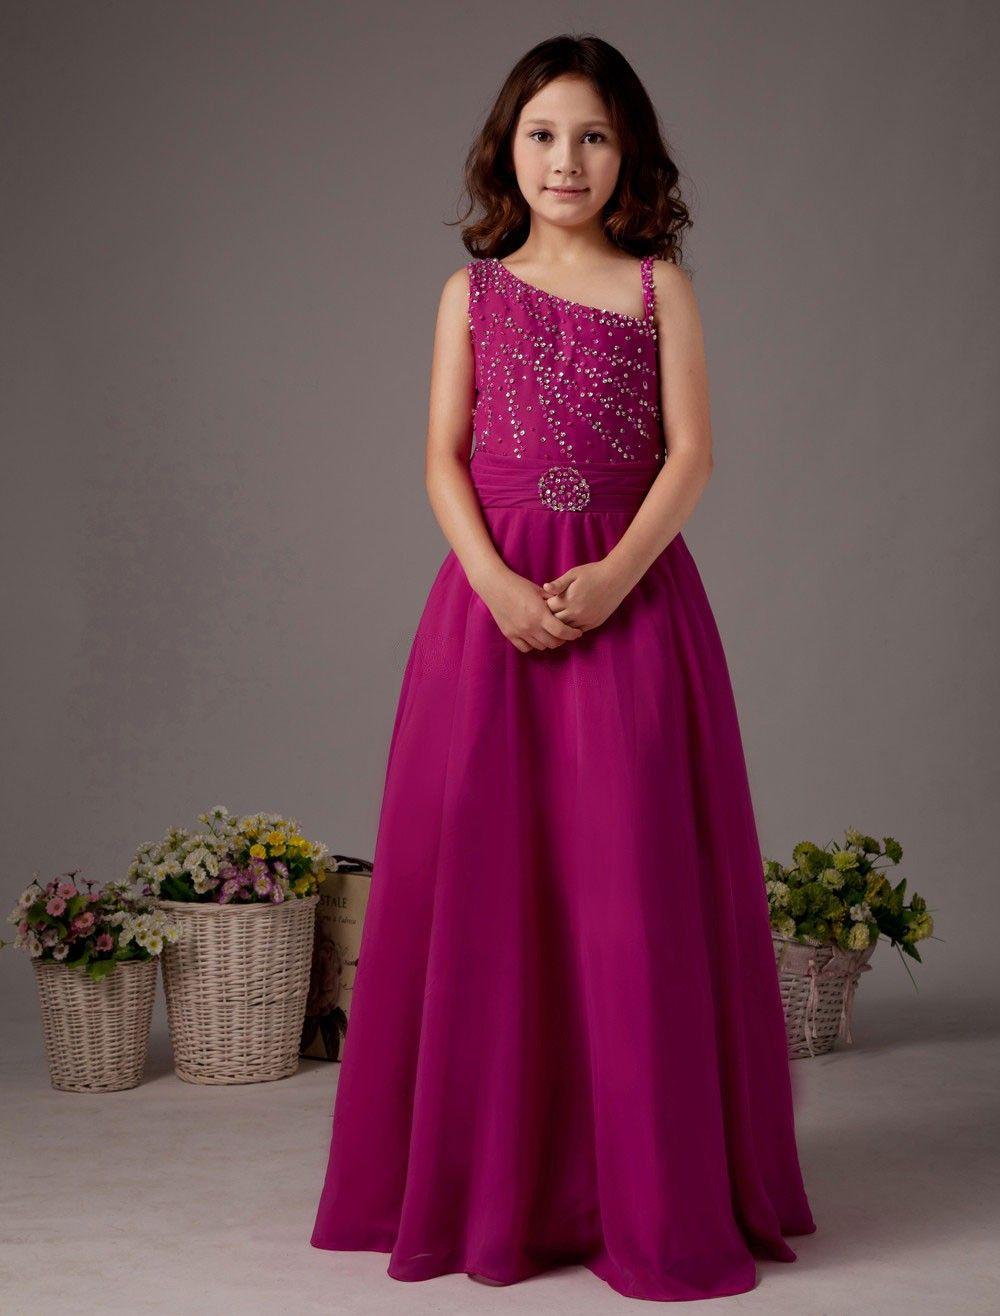 Sweet red chiffon one shoulder floor length little girlus dress